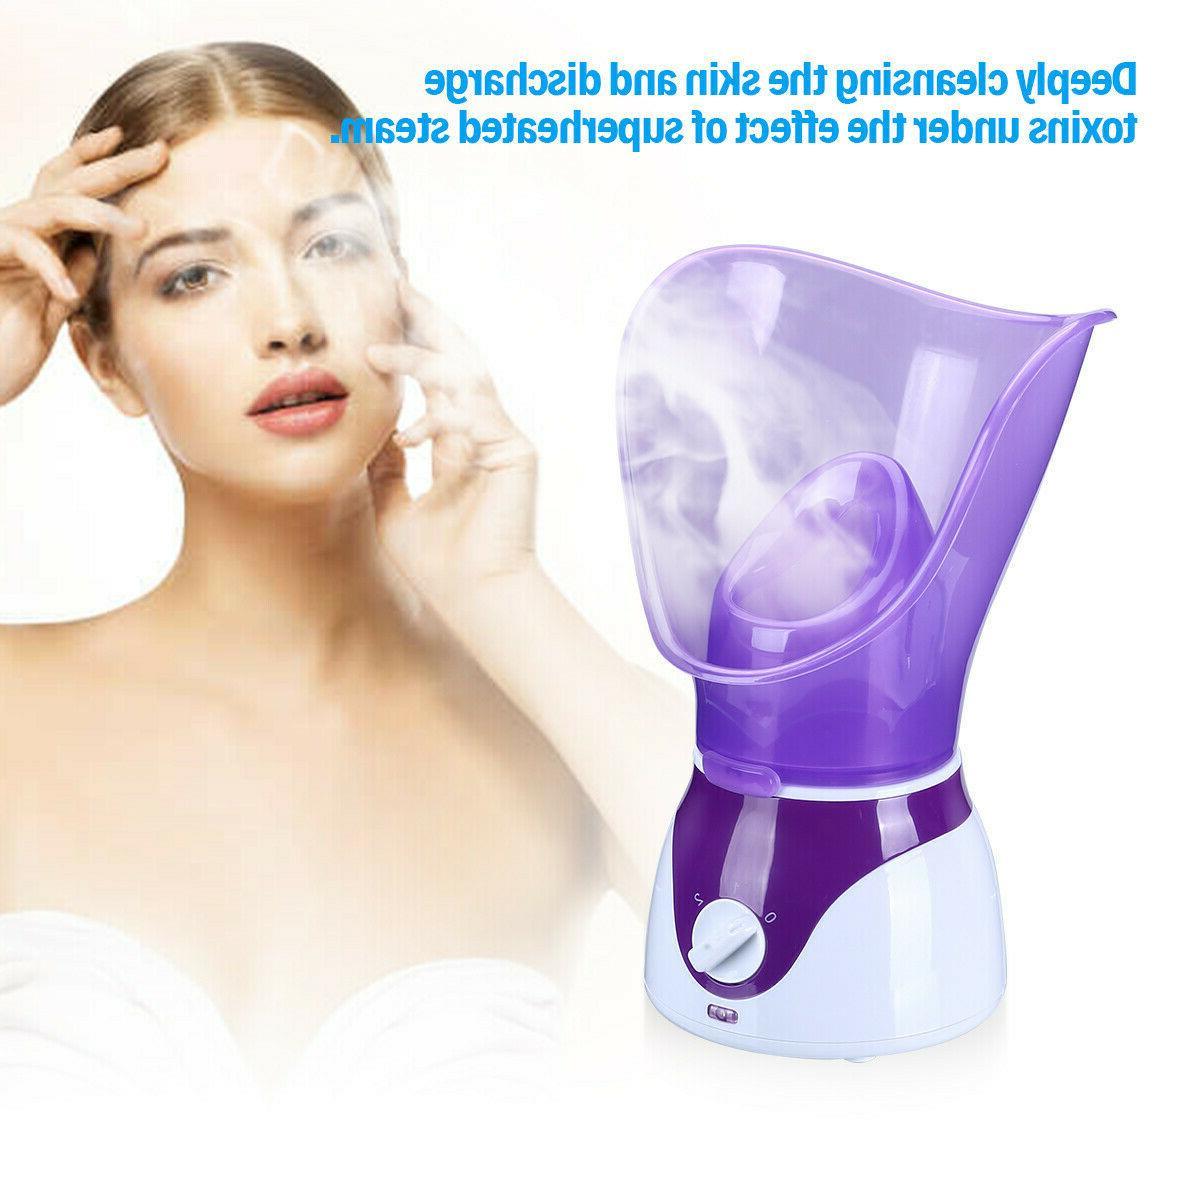 Face Facial Steamer Spa Pores Sprayer Skin Mist Cleaner Steaming Machine